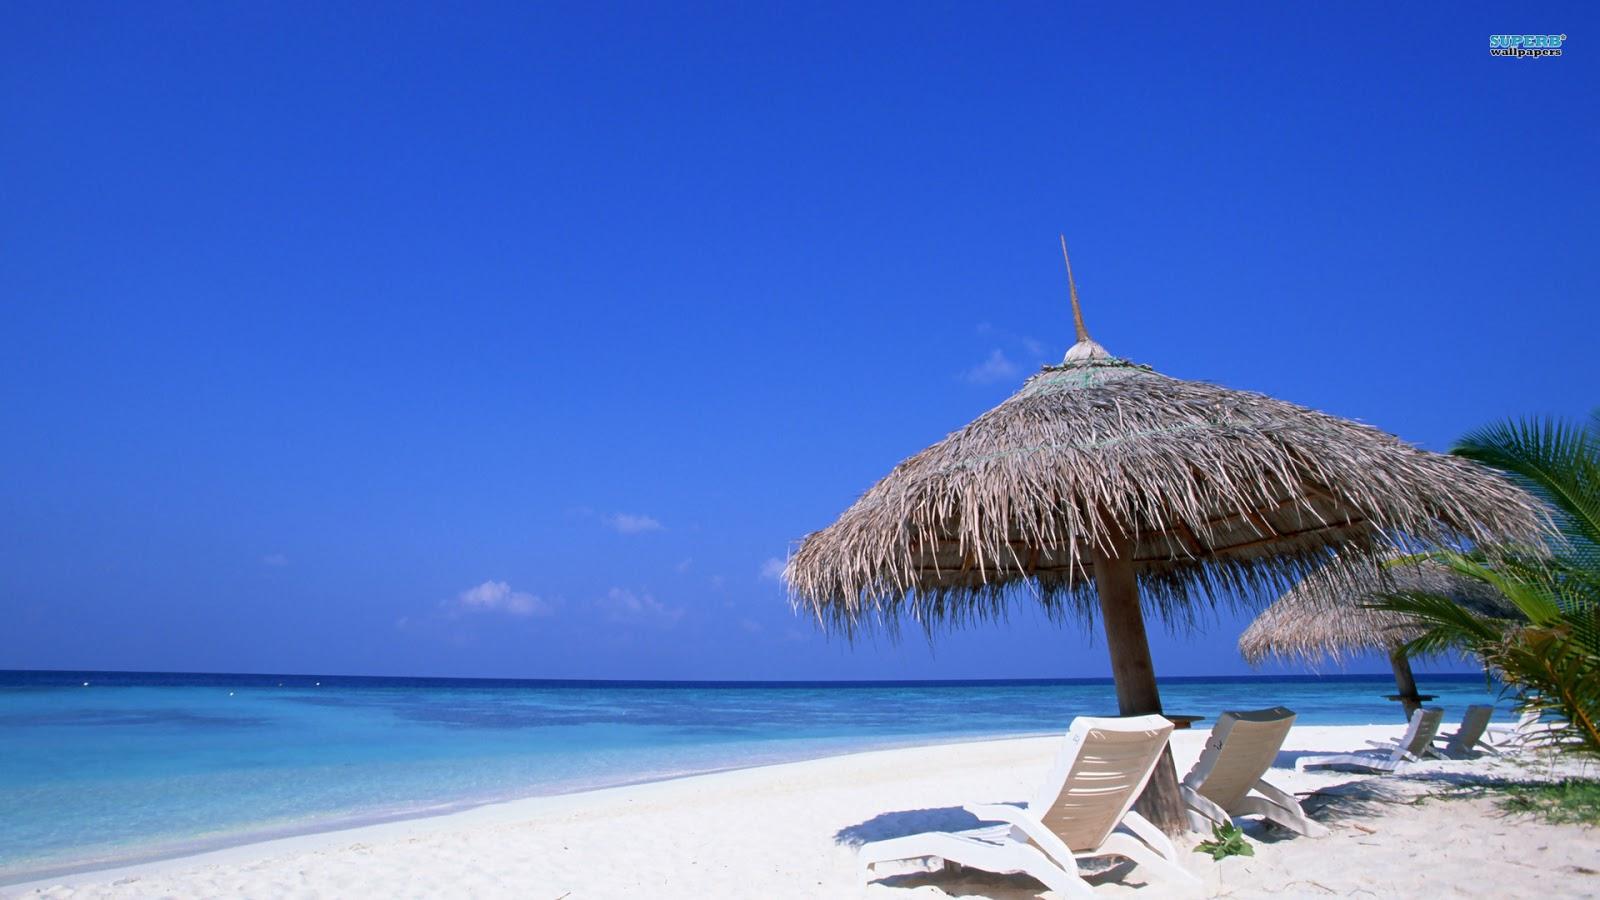 Wallpapers HD Wallpapers Tropicales Islas Playas  Full HD